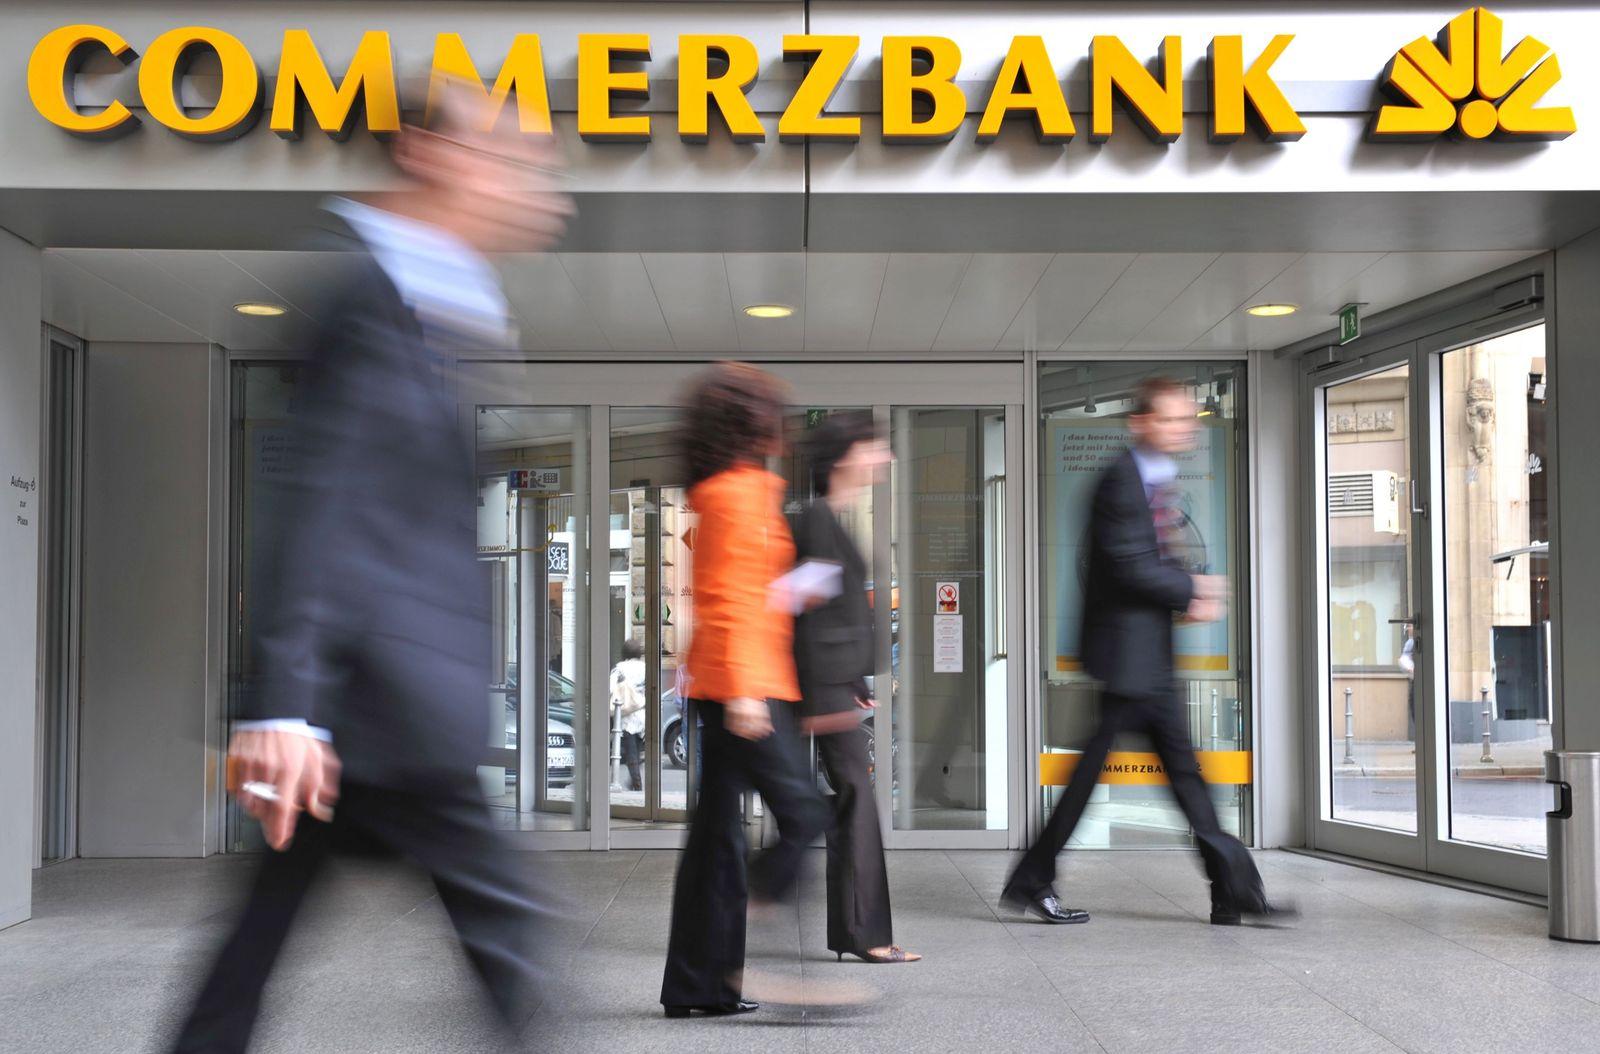 Commerzbank / Filiale / Frankfurt